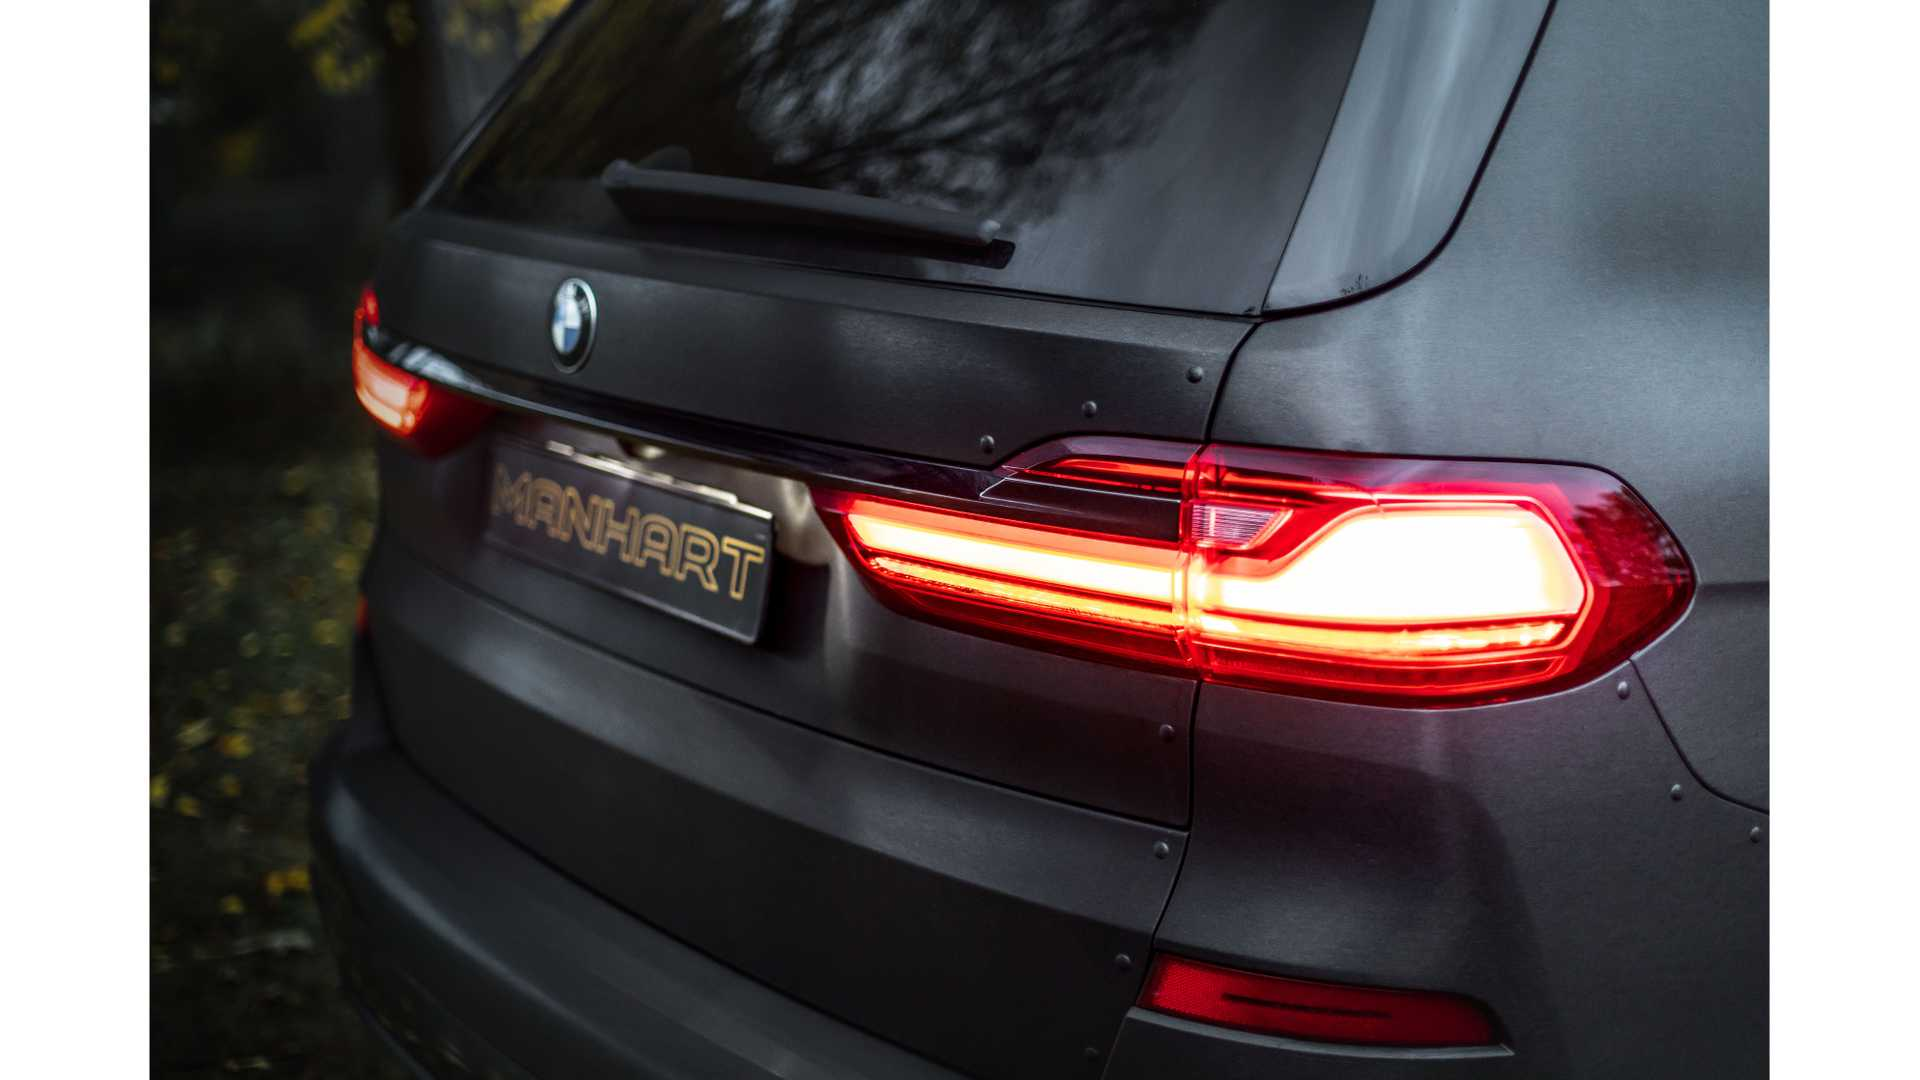 BMW-X7-Dirt-Edition-By-Manhart-12